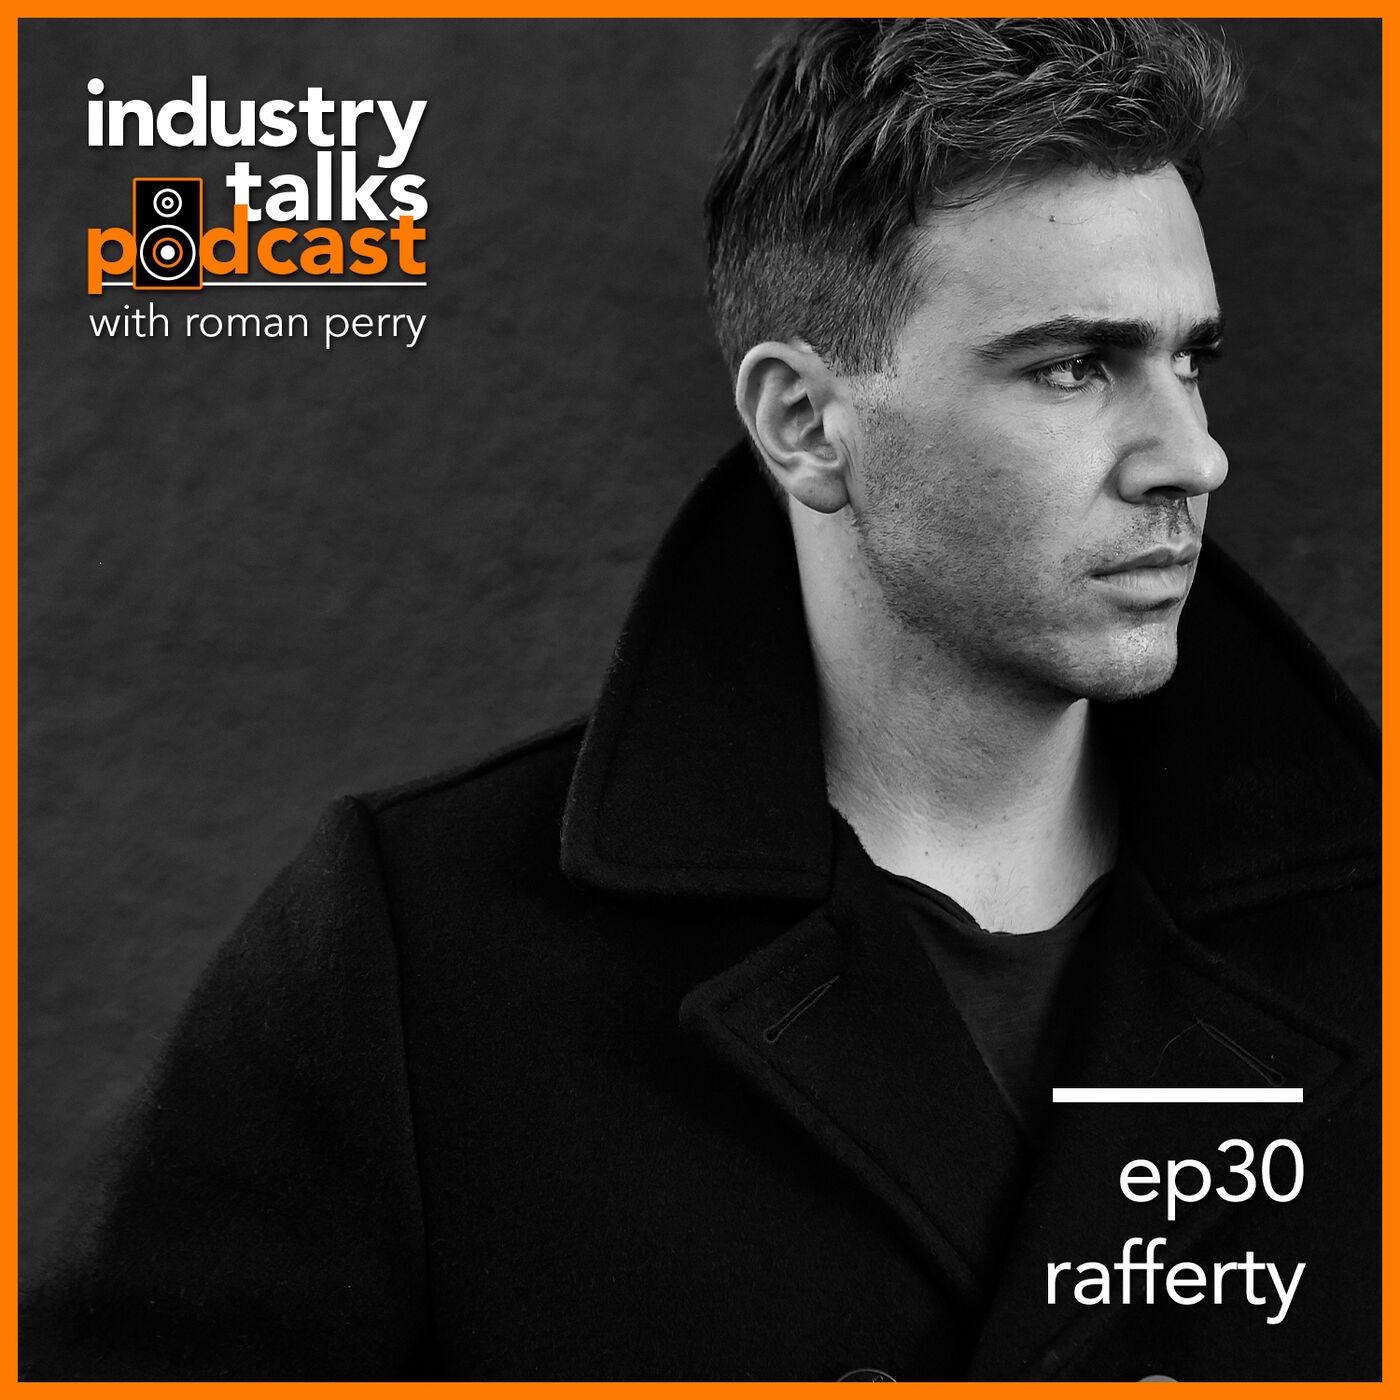 ep30 - Rafferty Smashes Through Music Industry Myths